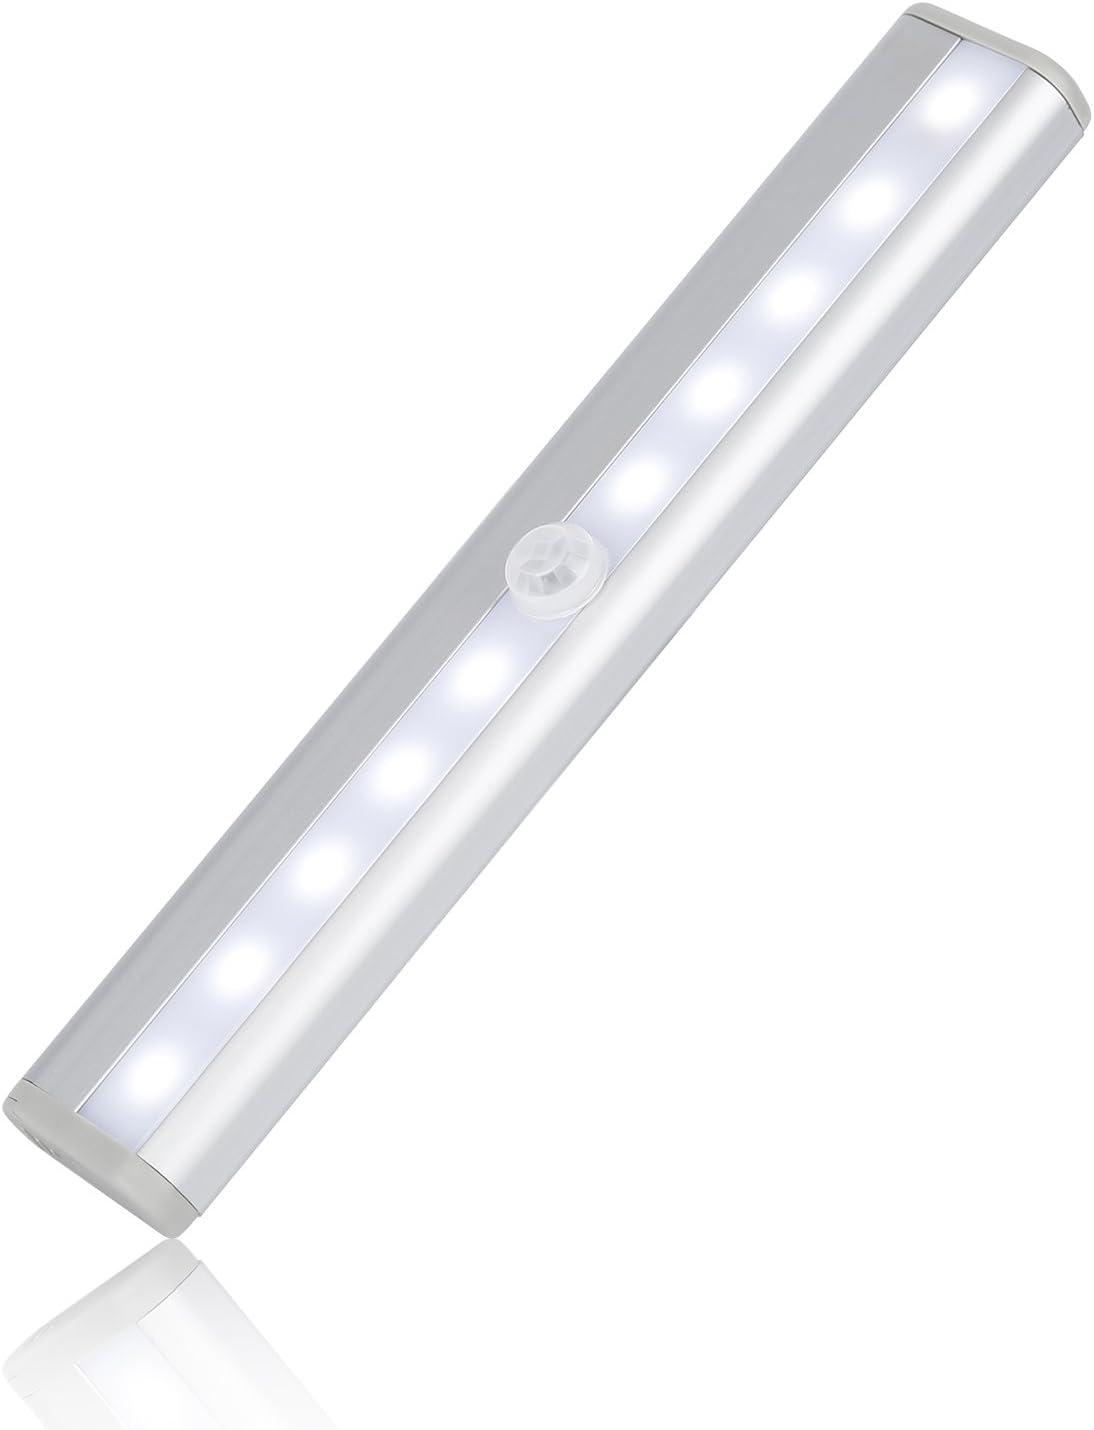 Tsing Barra de Luz con Sensor de Movimiento 10 LEDs Inalámbrica Lámpara Nocturna para Armario/Cajón/Camino (Blanco)